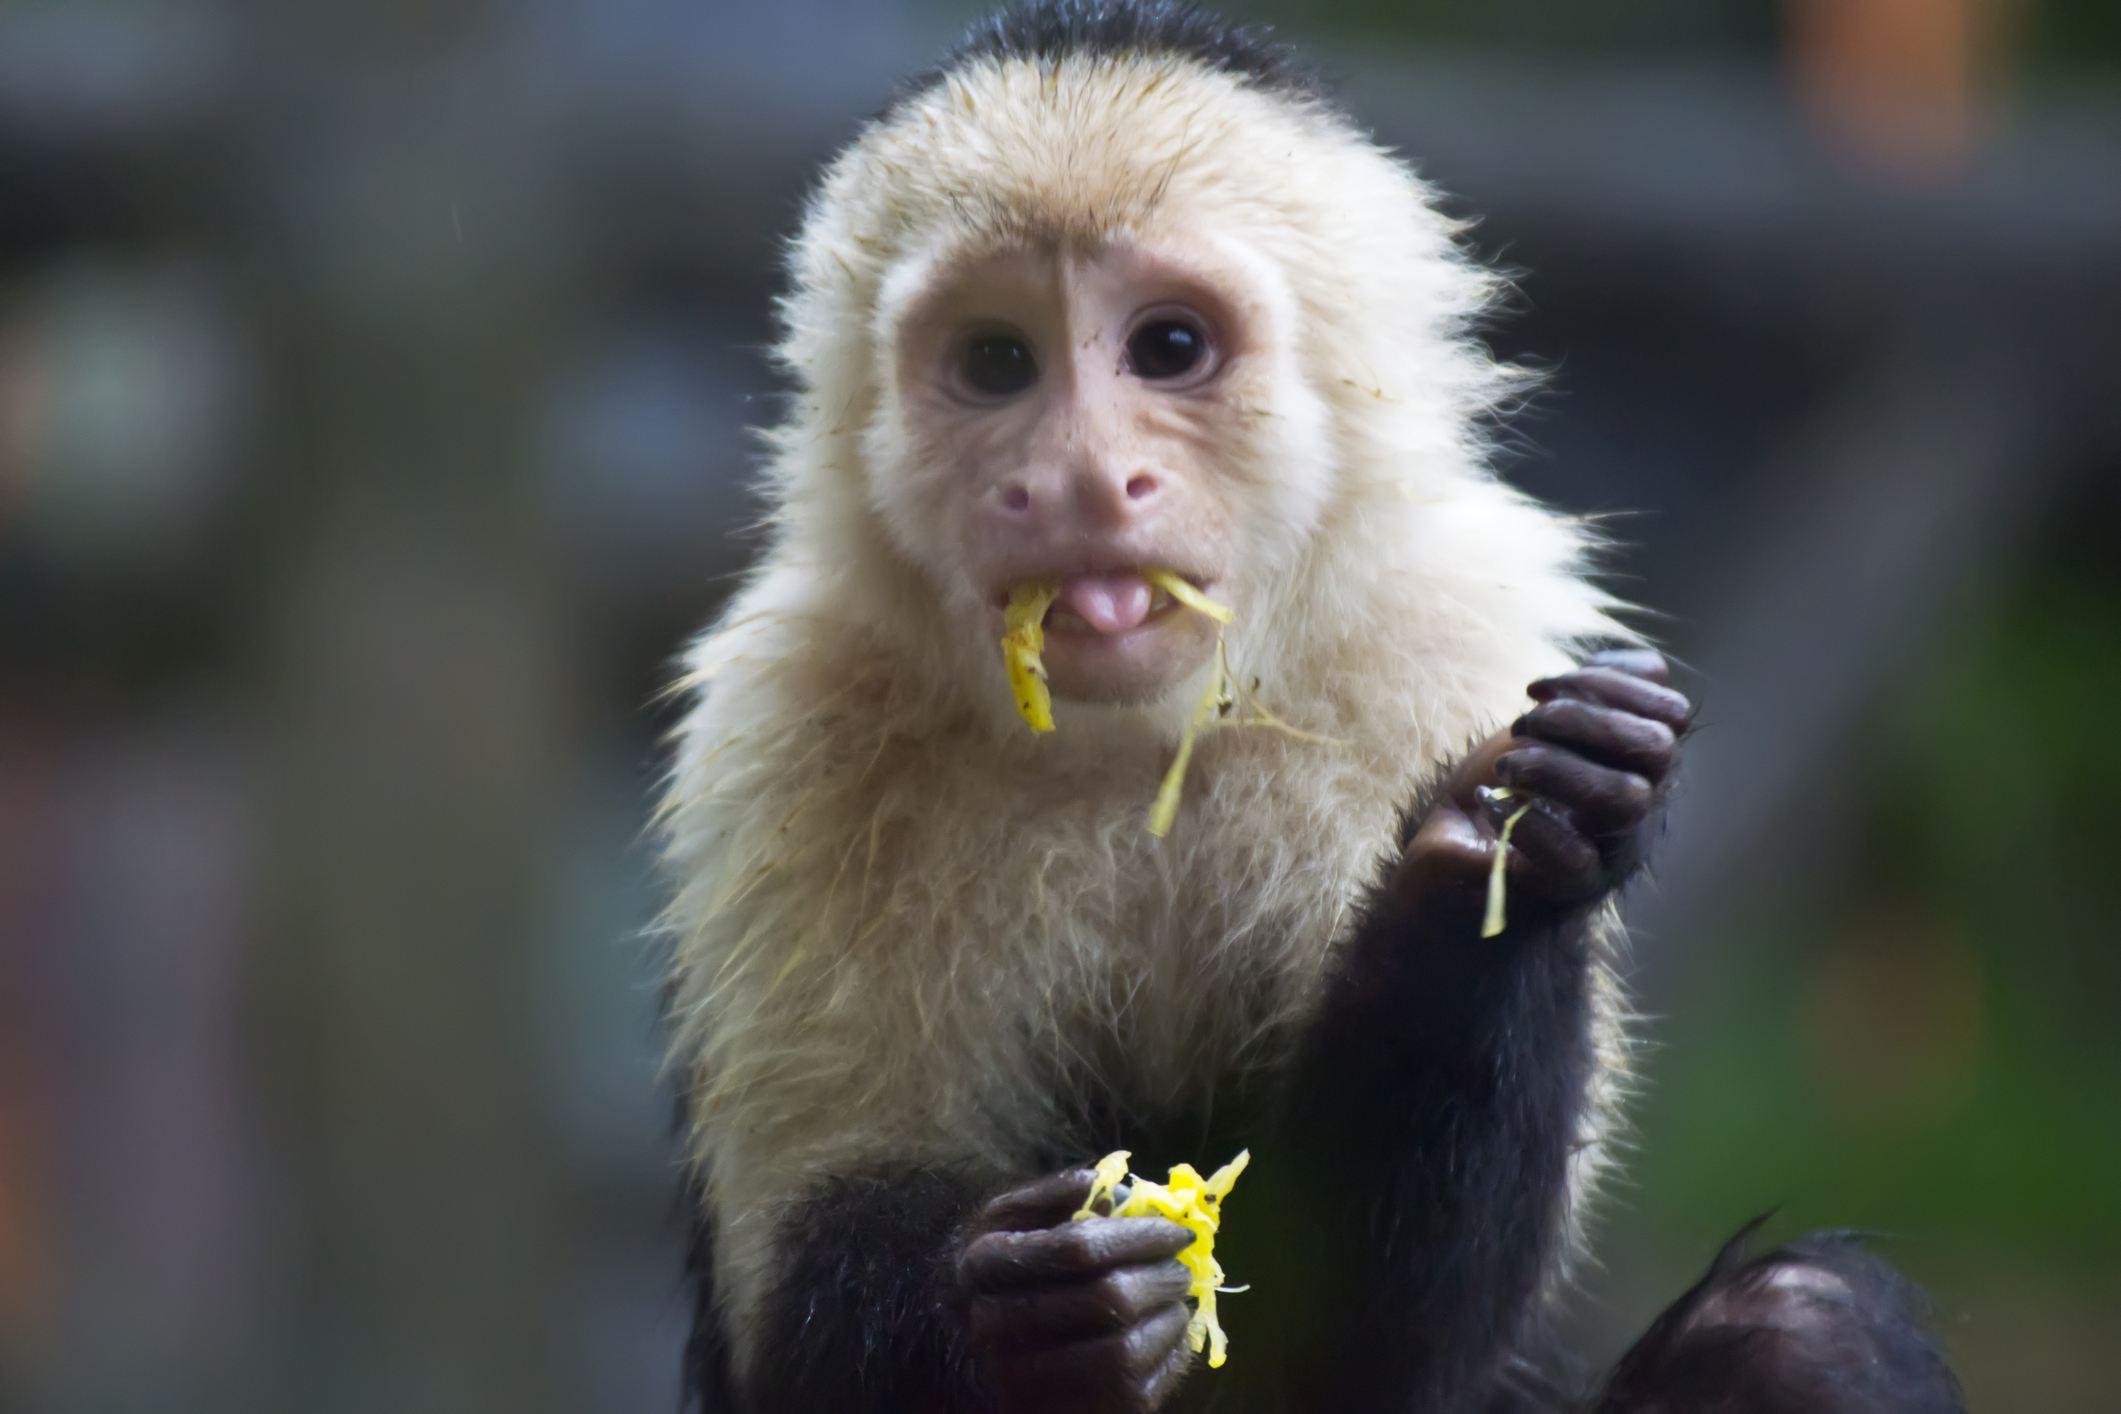 A Capuchin eating a fruit